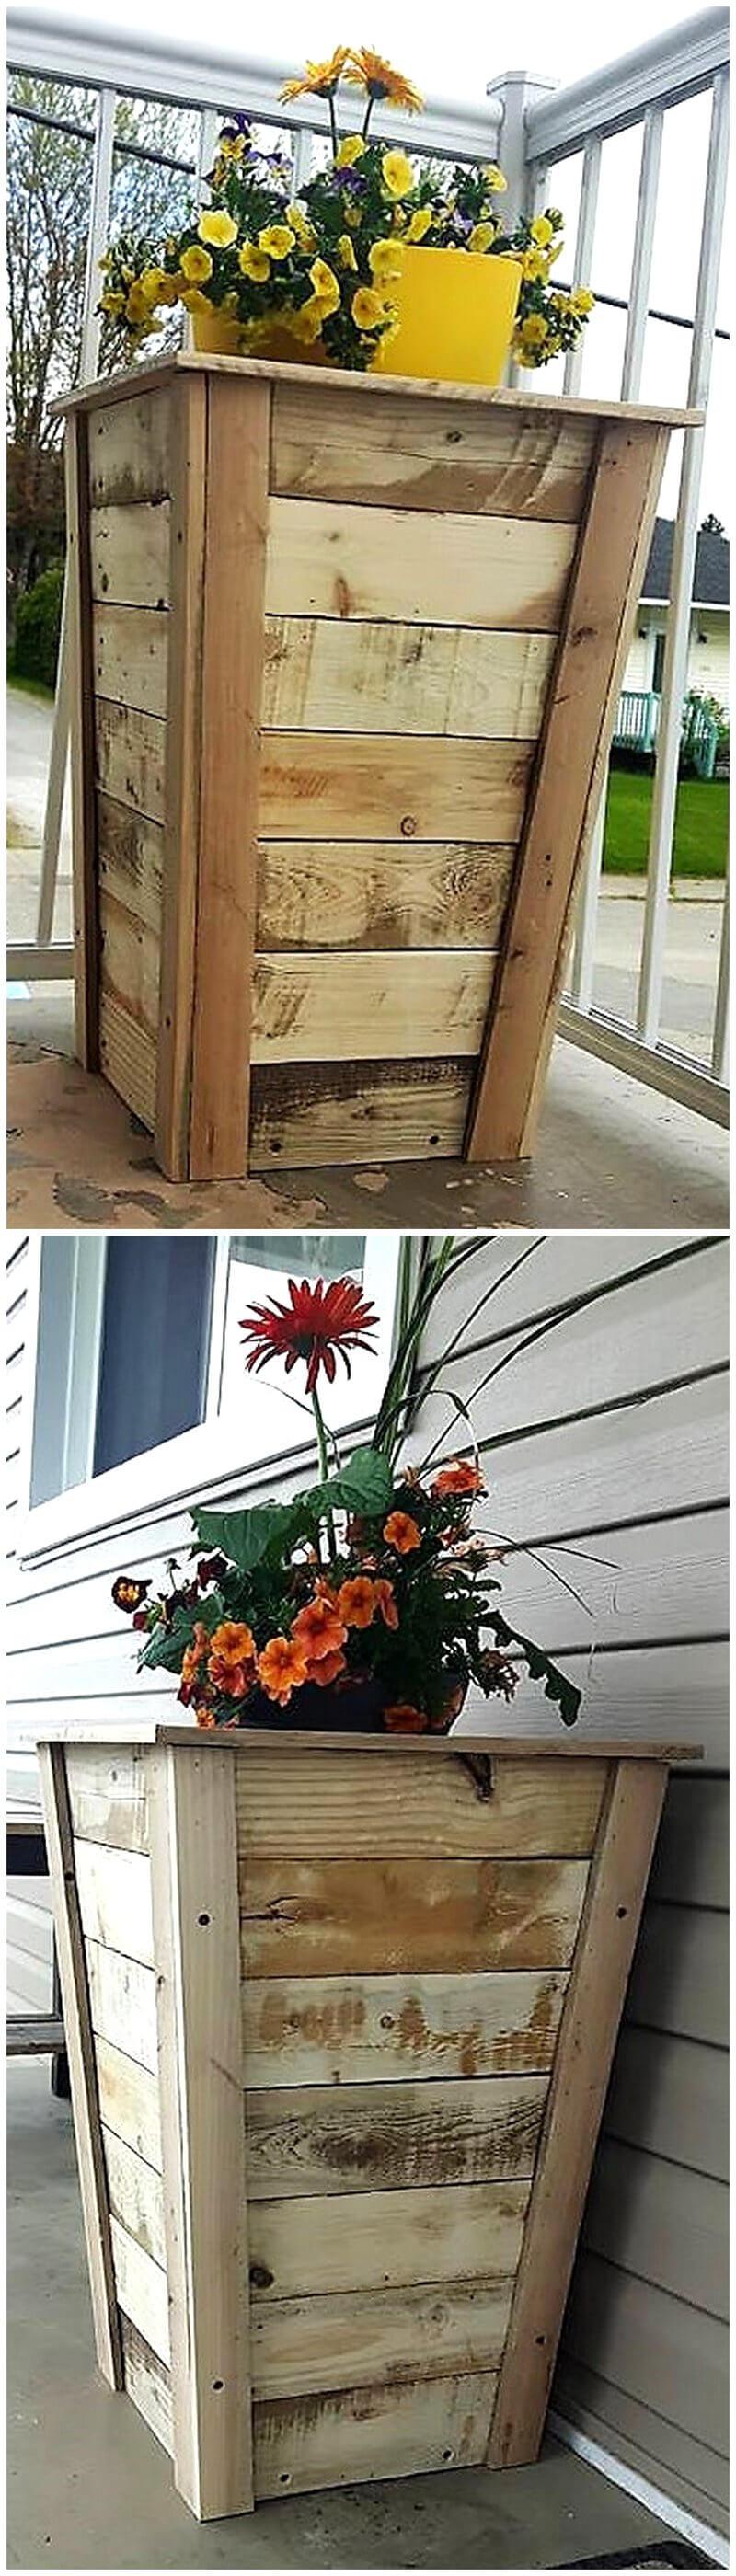 wooden pallets planters